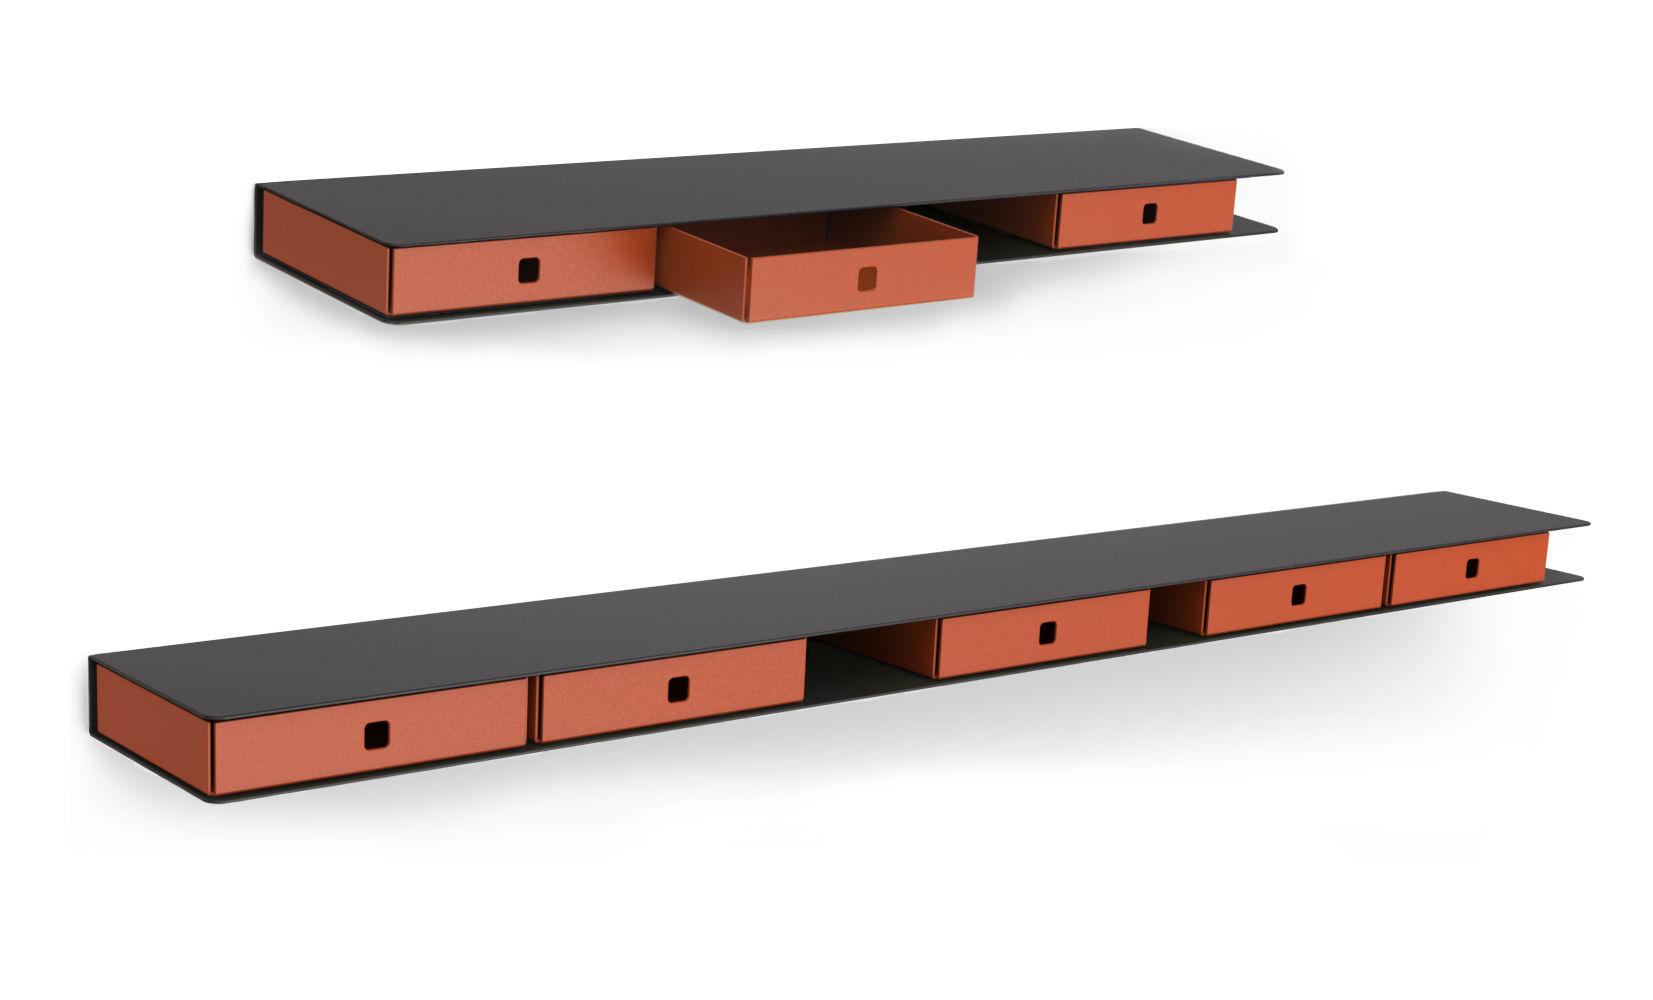 etag re aliz 4 tiroirs l 120 cm anthracite tiroirs orange mati re grise. Black Bedroom Furniture Sets. Home Design Ideas